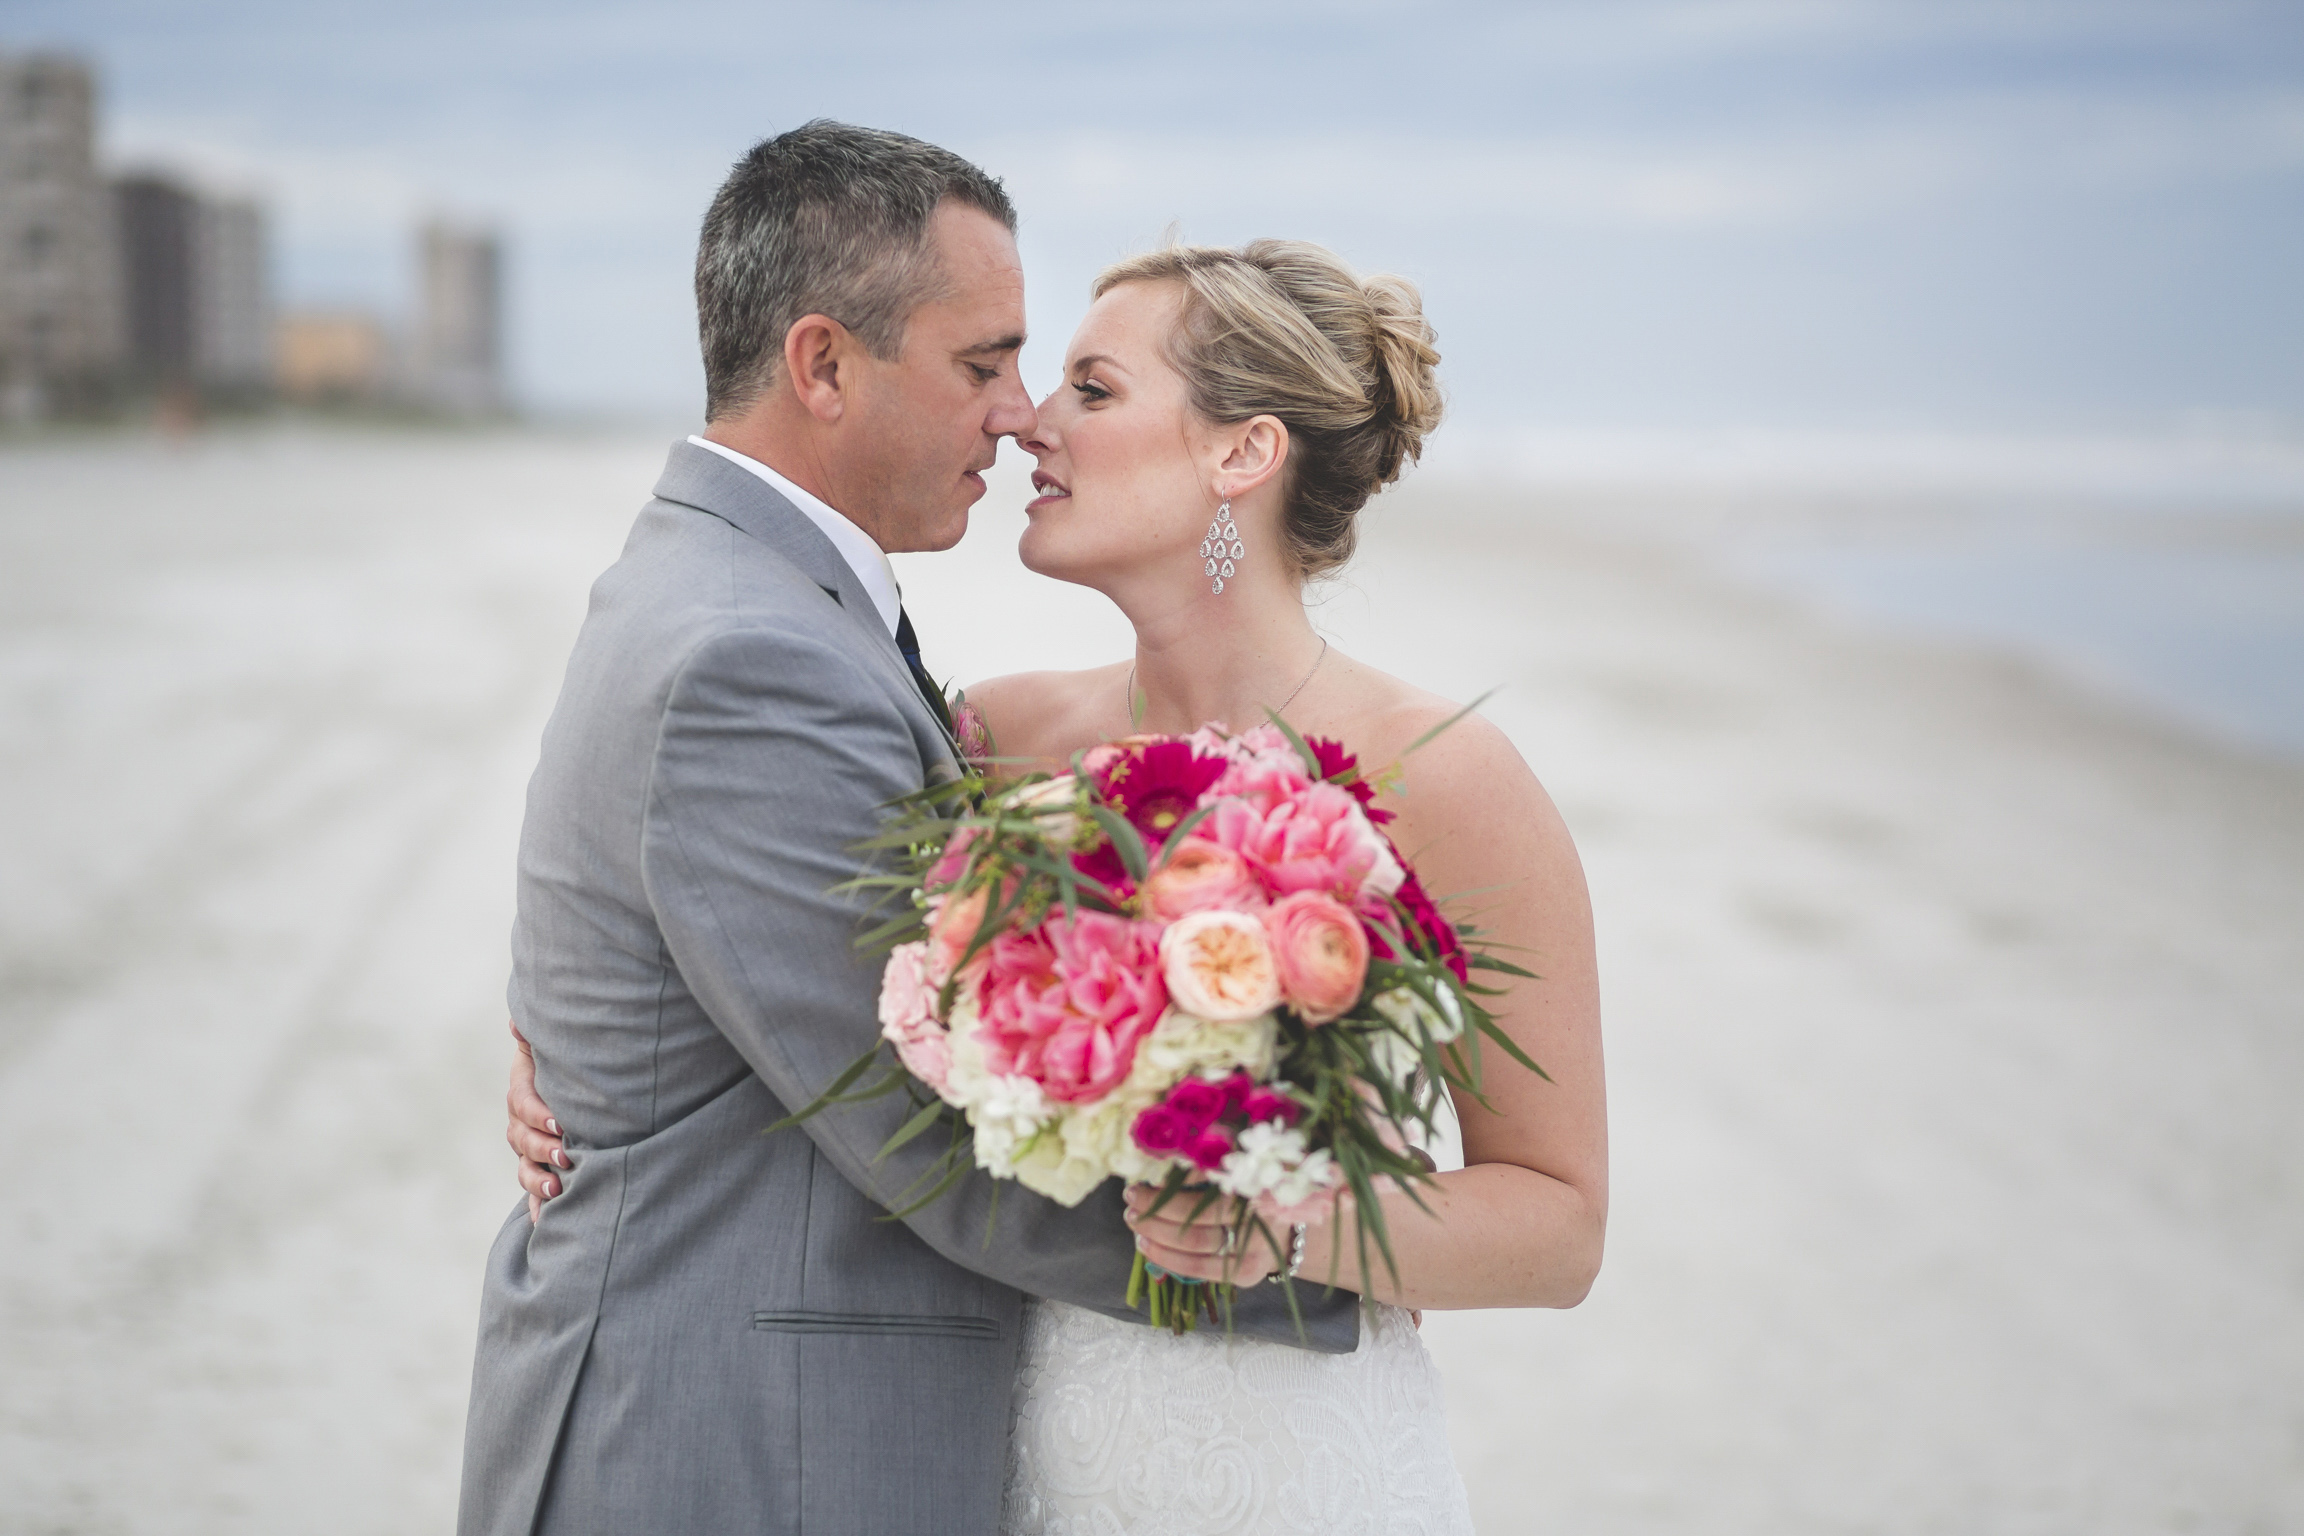 adam-szarmack-casa-marina-wedding-photographer-jacksonville-beach-florida-42.jpg